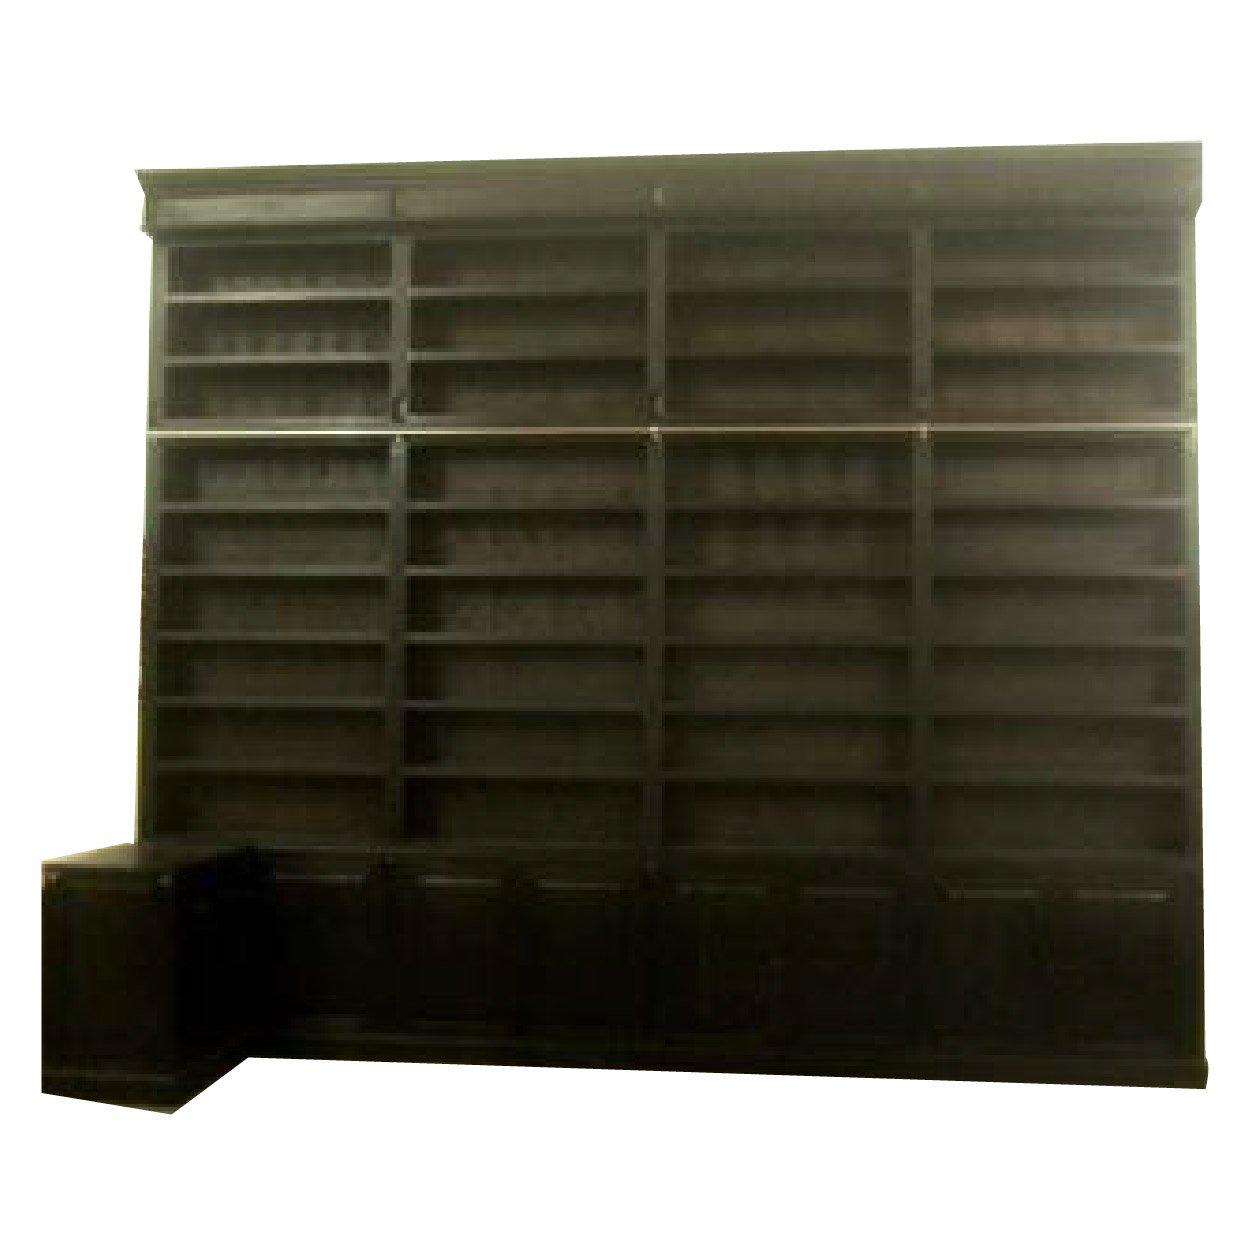 Fonkelnieuw Boekenkast 'Bibliotheekkast' 450x30_35x380 cm - OLMEGA Rotterdam GW-87